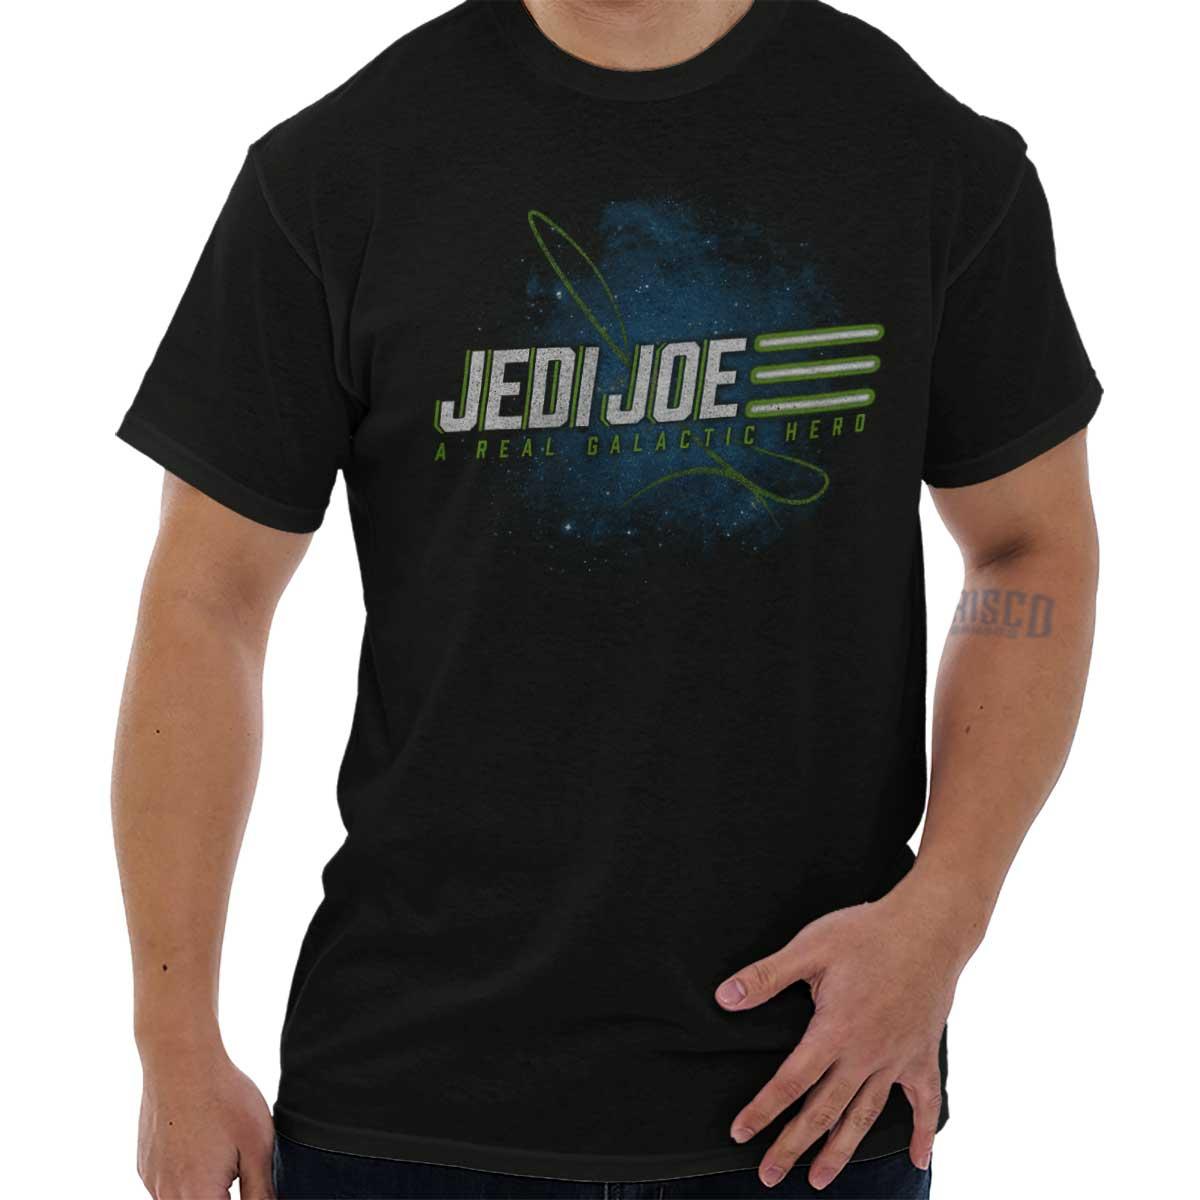 GI Joe Star Wars Jedi ShirtDarth Vader Rogue One Han Solo Sleeveless T Shirt